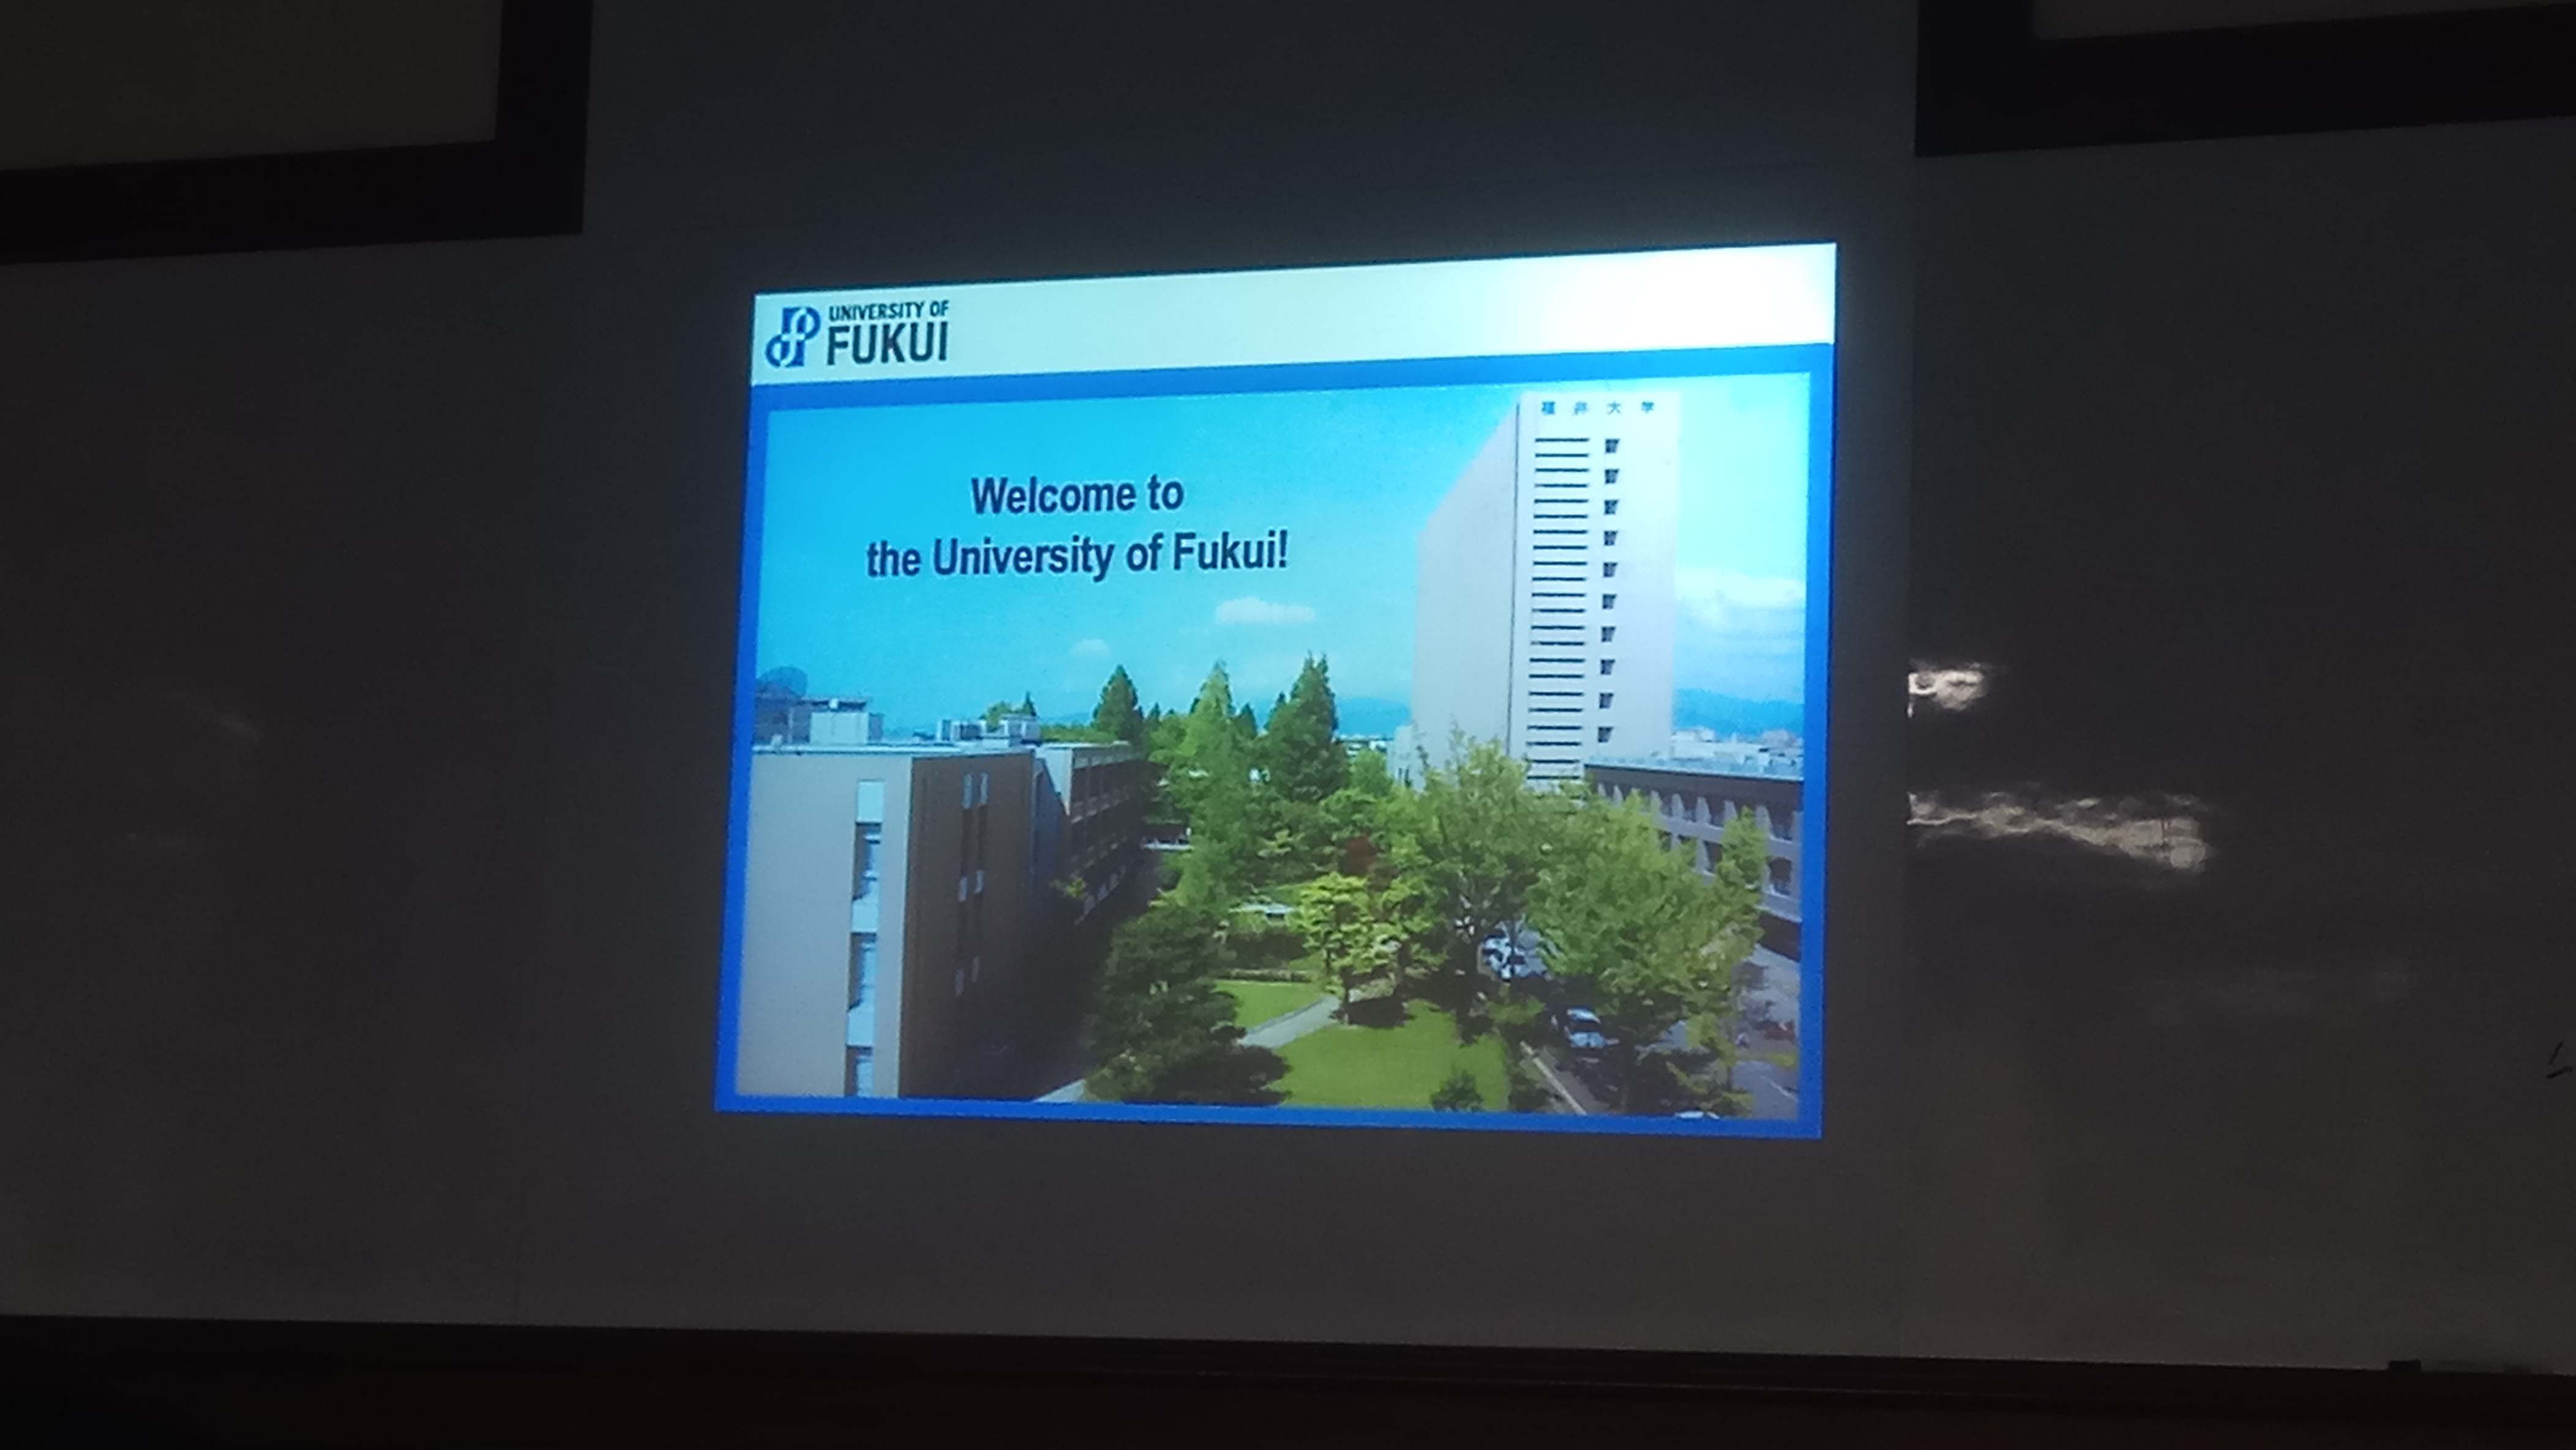 Guest Lecturer 22 Februari 2018 University of Fukui